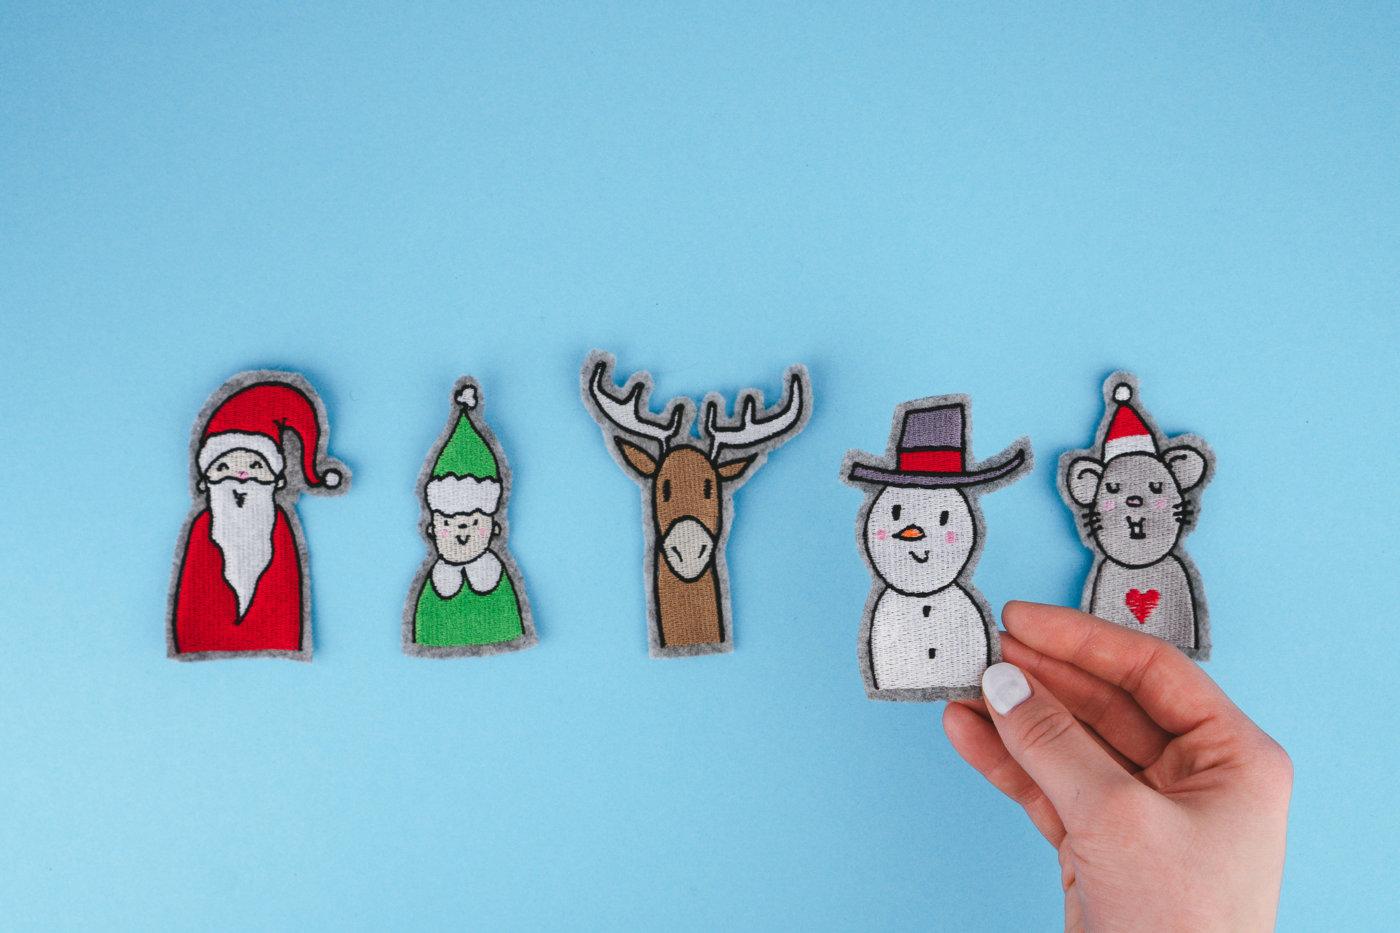 Stickdateien Weihnachten stickdateien weihnachten 5x Stickdateien »Weihnachten« ❤️ stickdateien christmas friends 02 1400x933